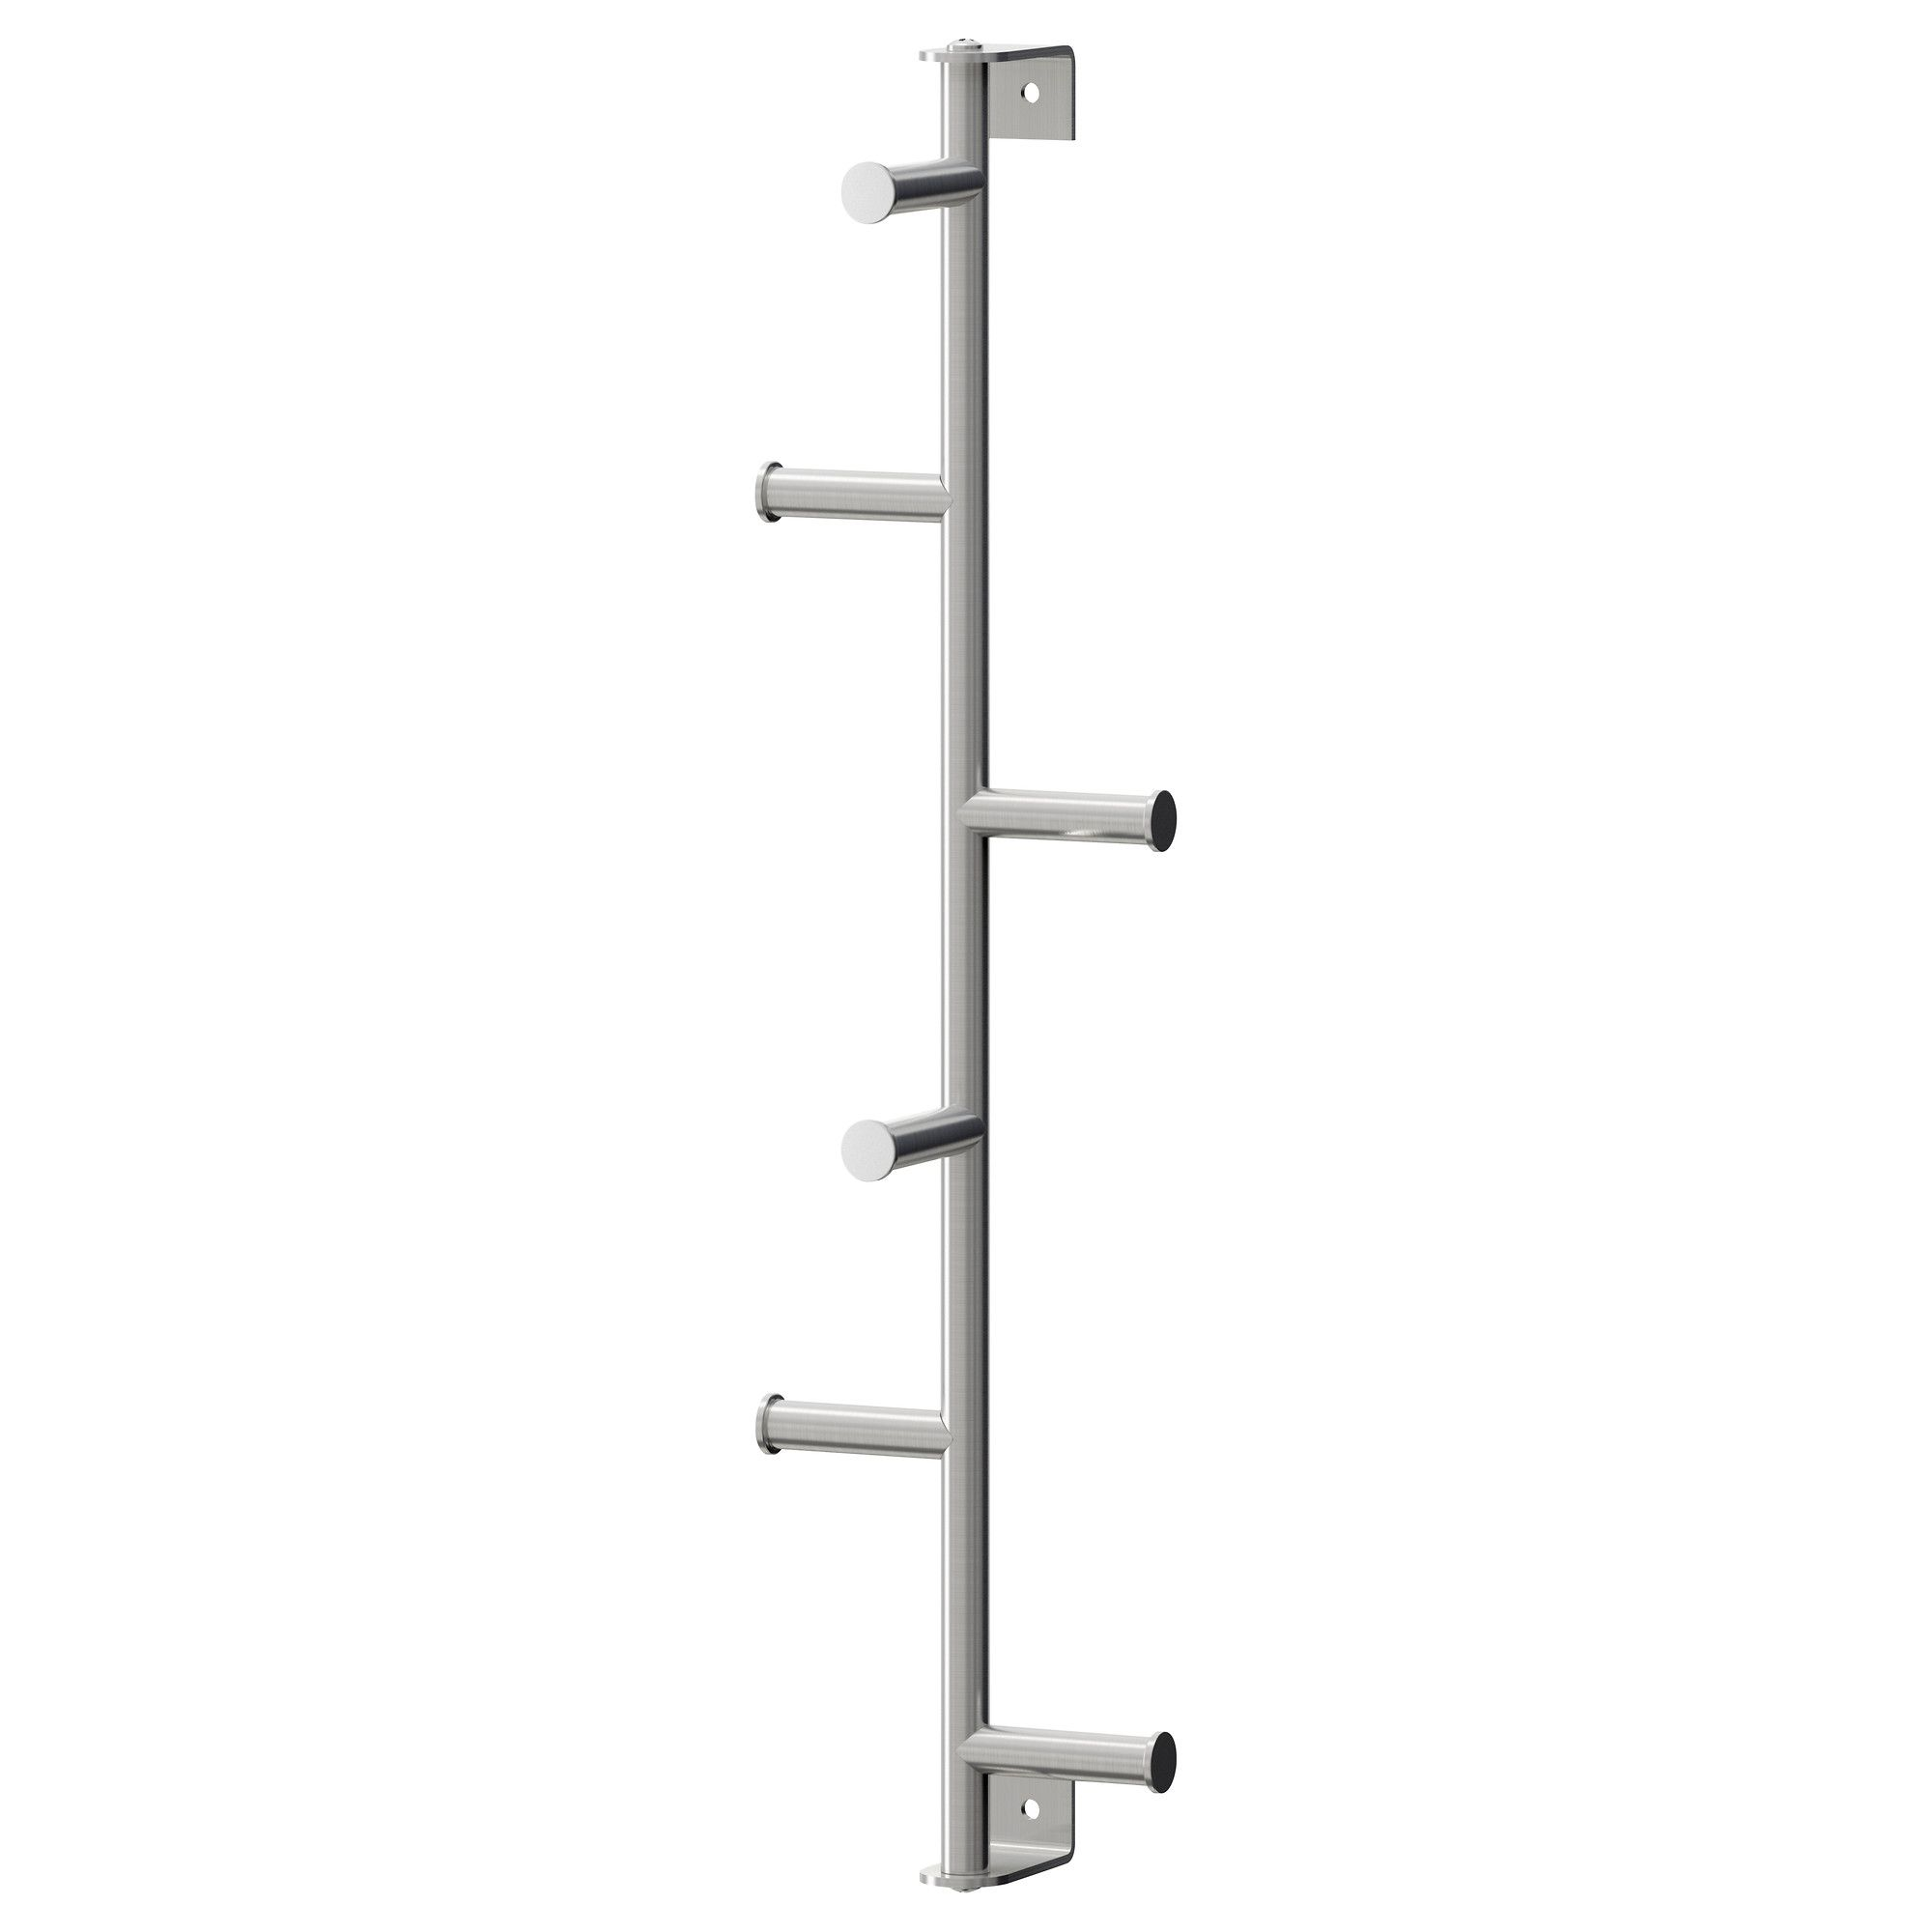 Ikea Us Furniture And Home Furnishings Ikea Modern Towel Bars Retro Bathrooms